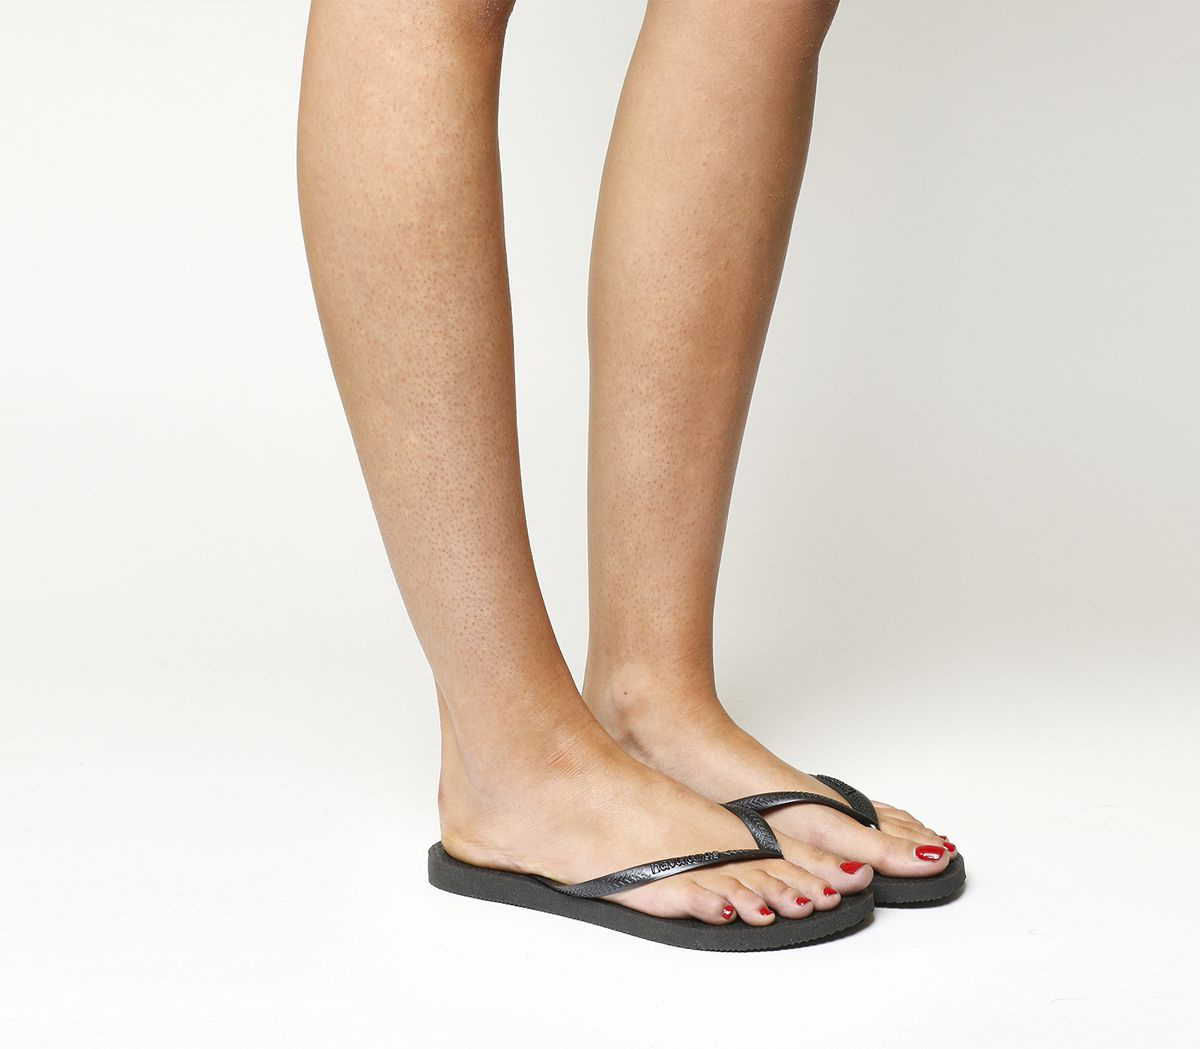 323dacef5 Havaianas Slim Flip Flop Black - Sandals